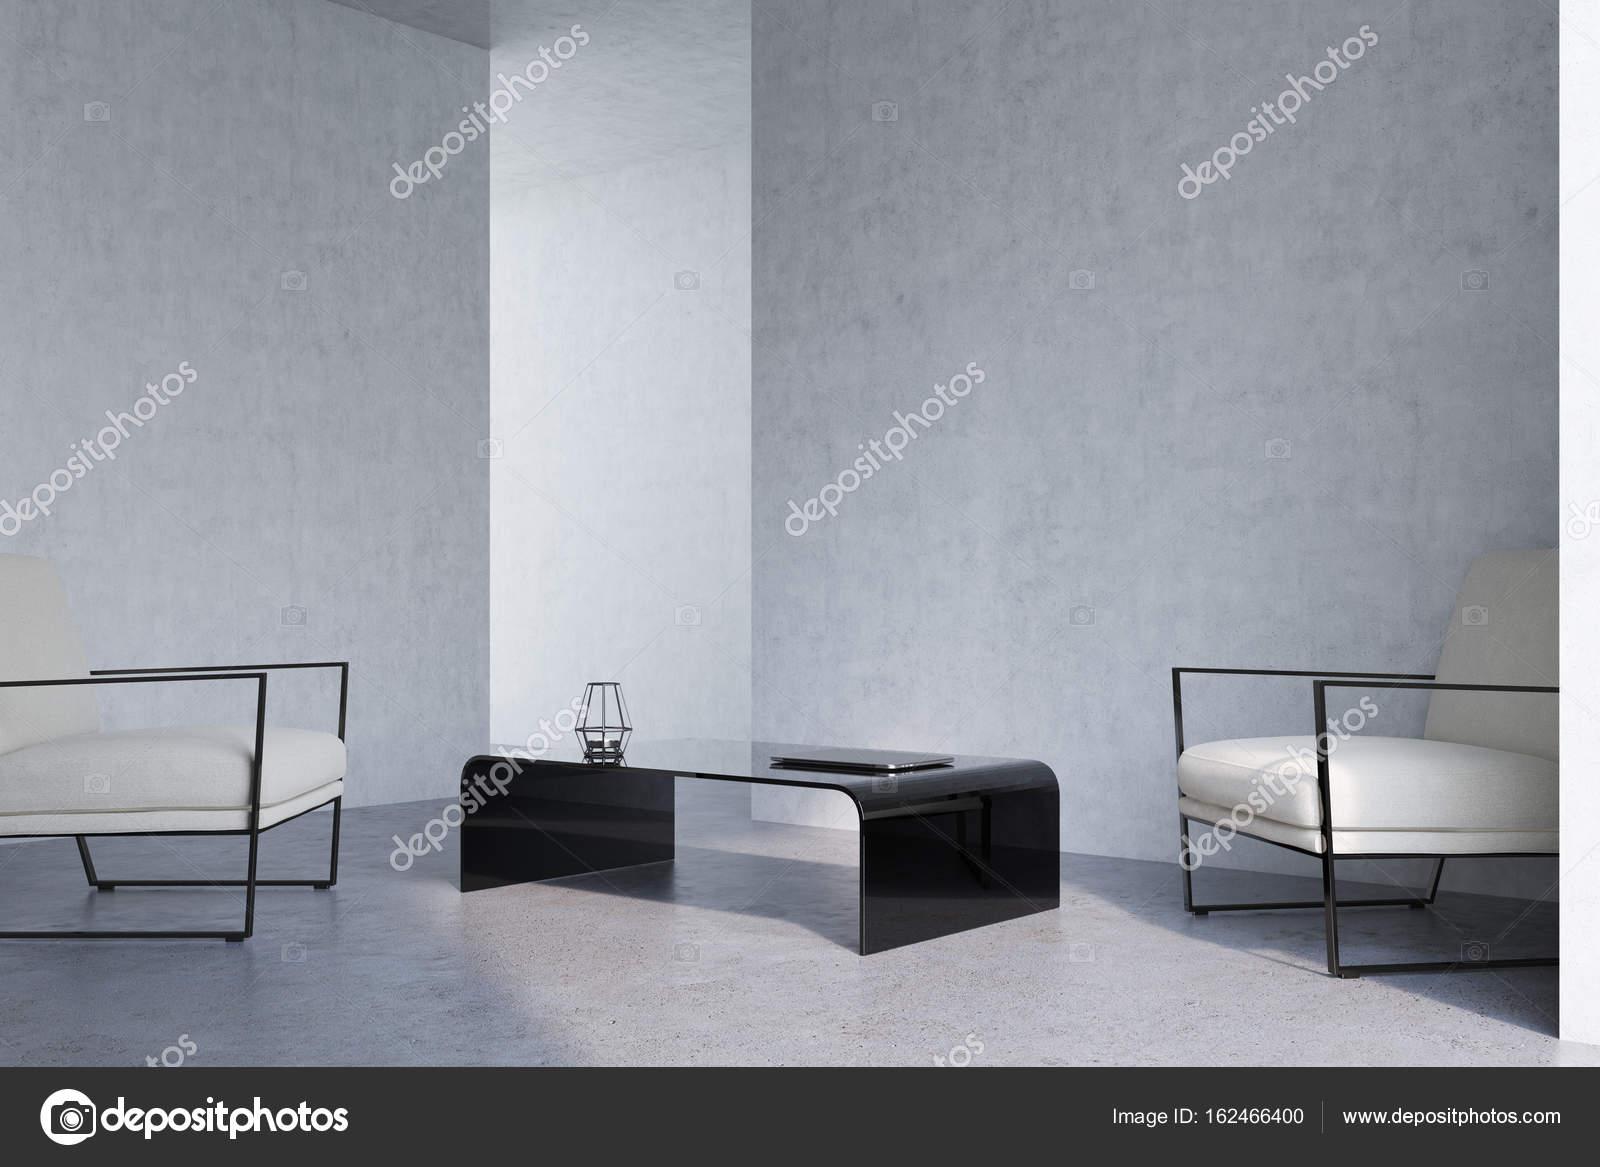 Woonkamer Met Beton : Beton woonkamer fauteuils hoek u stockfoto denisismagilov